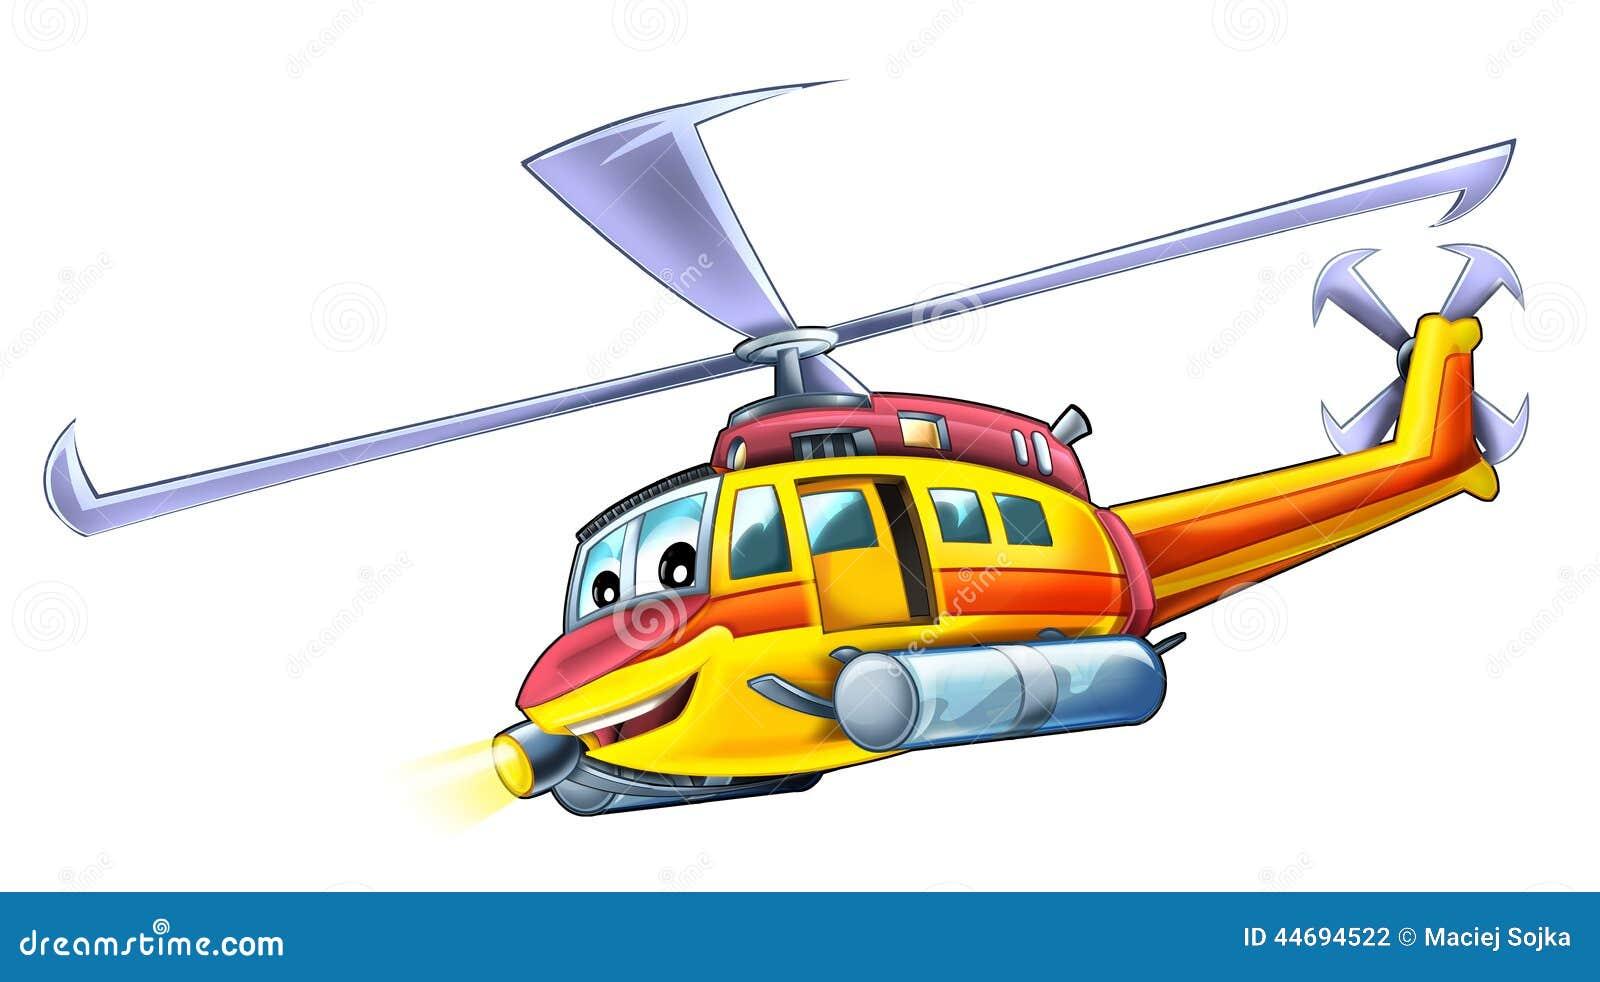 Cartoon Helicopter Stock Illustration Image 44694522